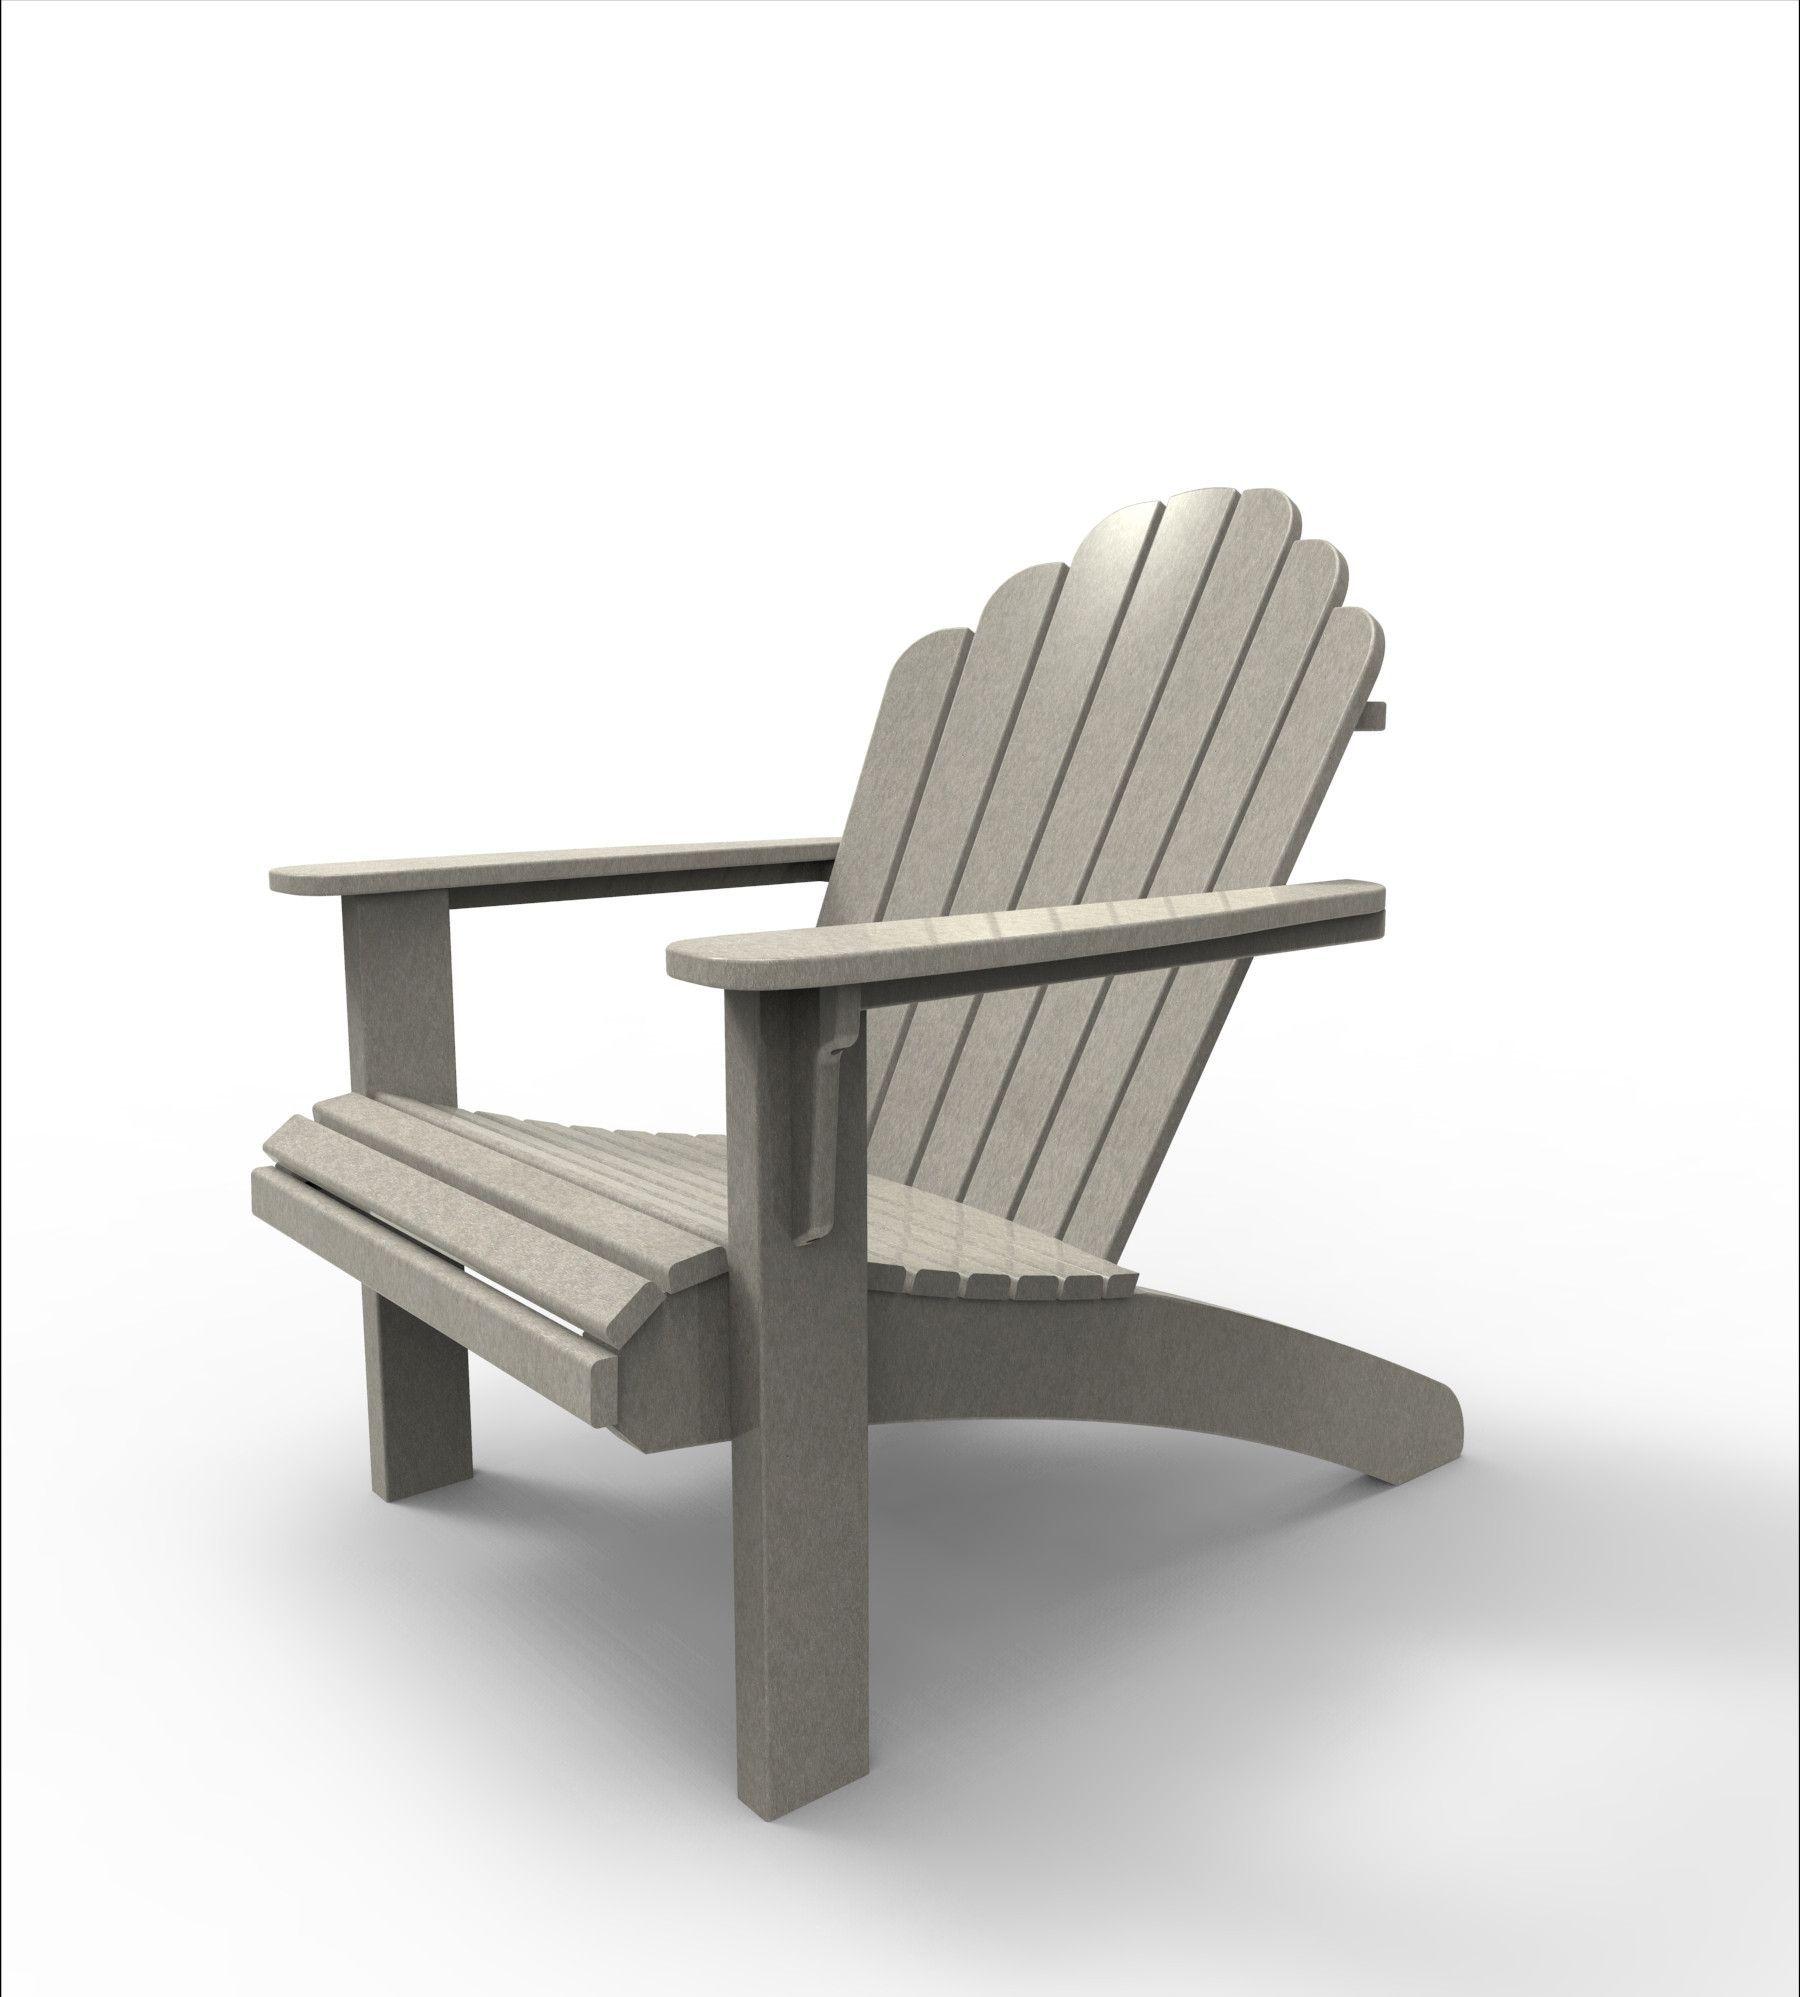 Malibu Outdoor Living Hampton Adirondack Chair